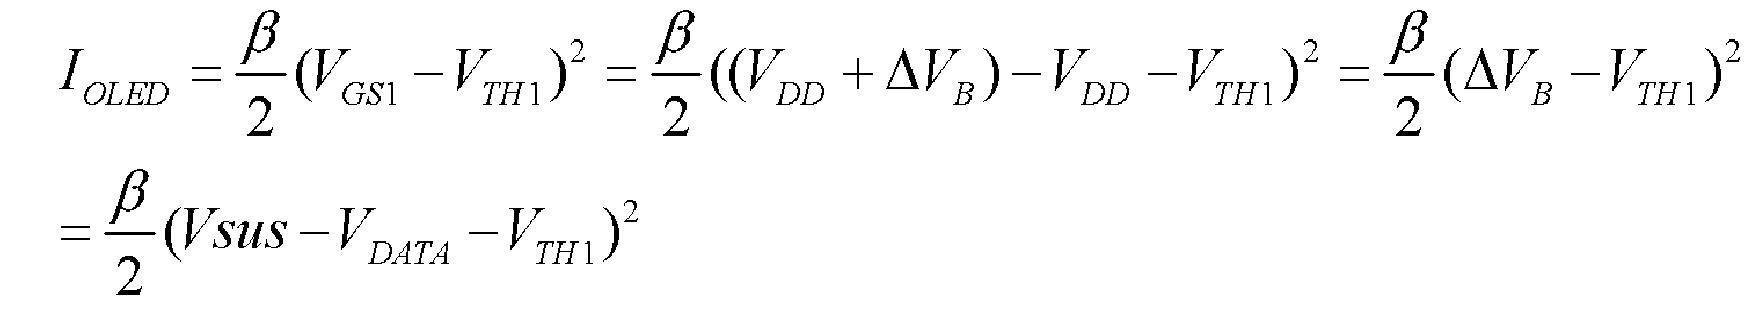 Figure 112003045082714-pat00004